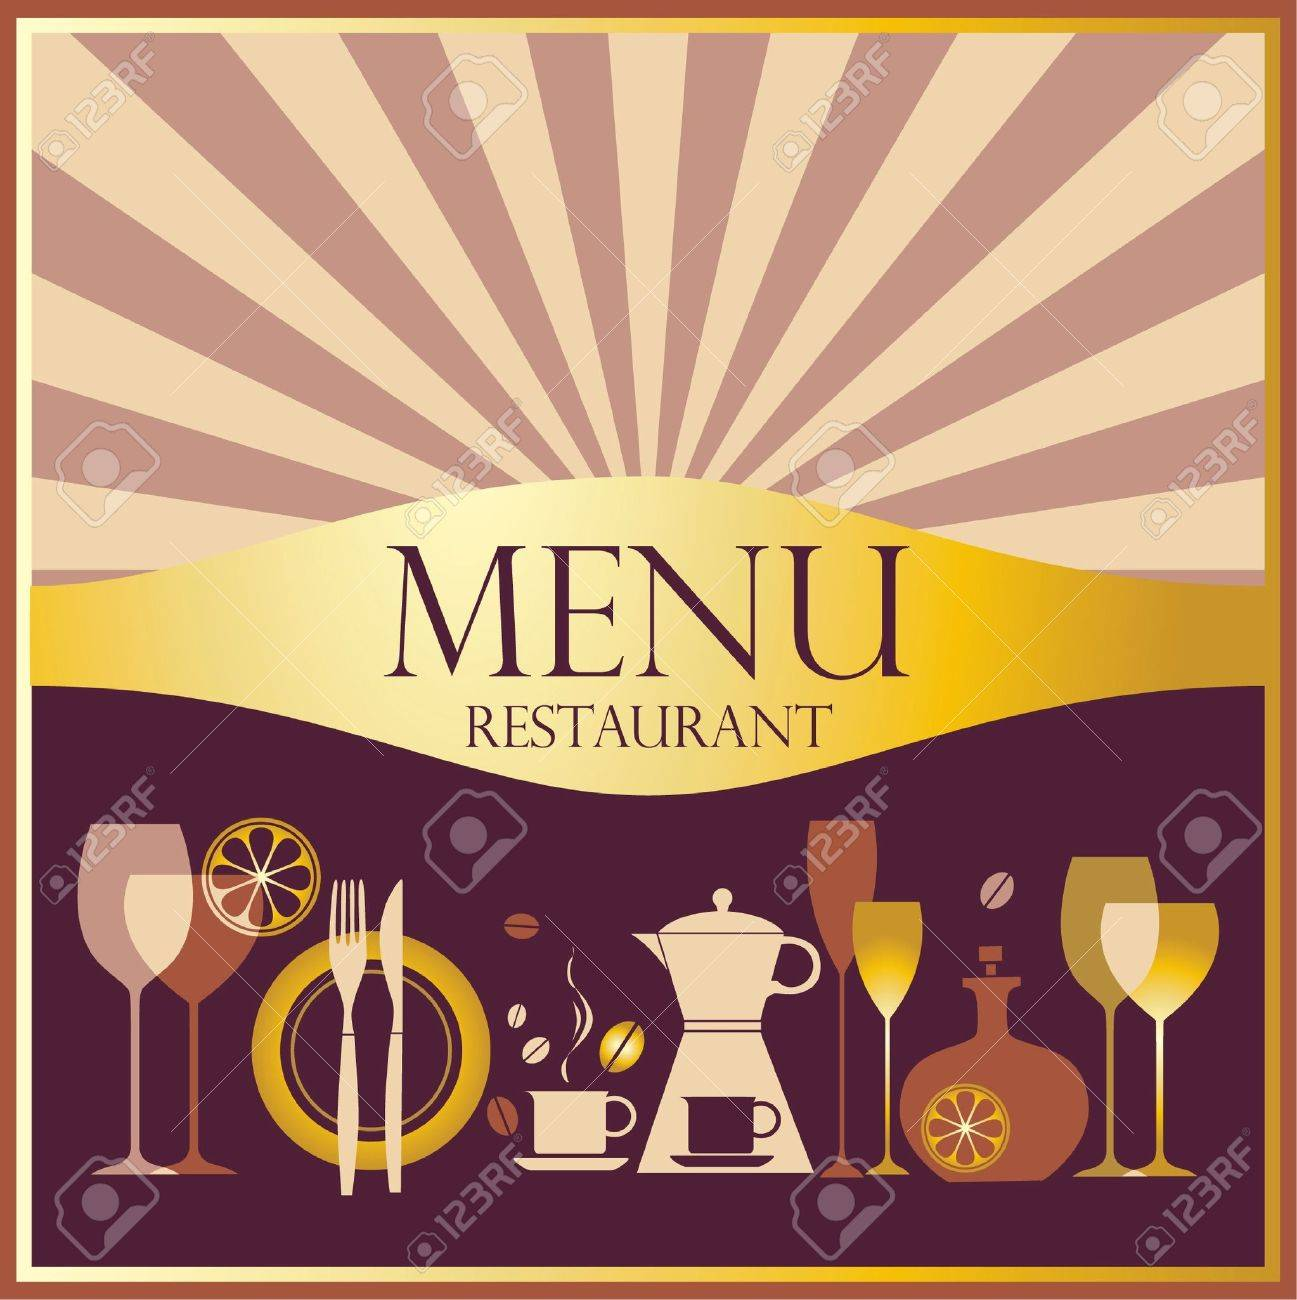 Restaurant menu design Stock Vector - 11648284